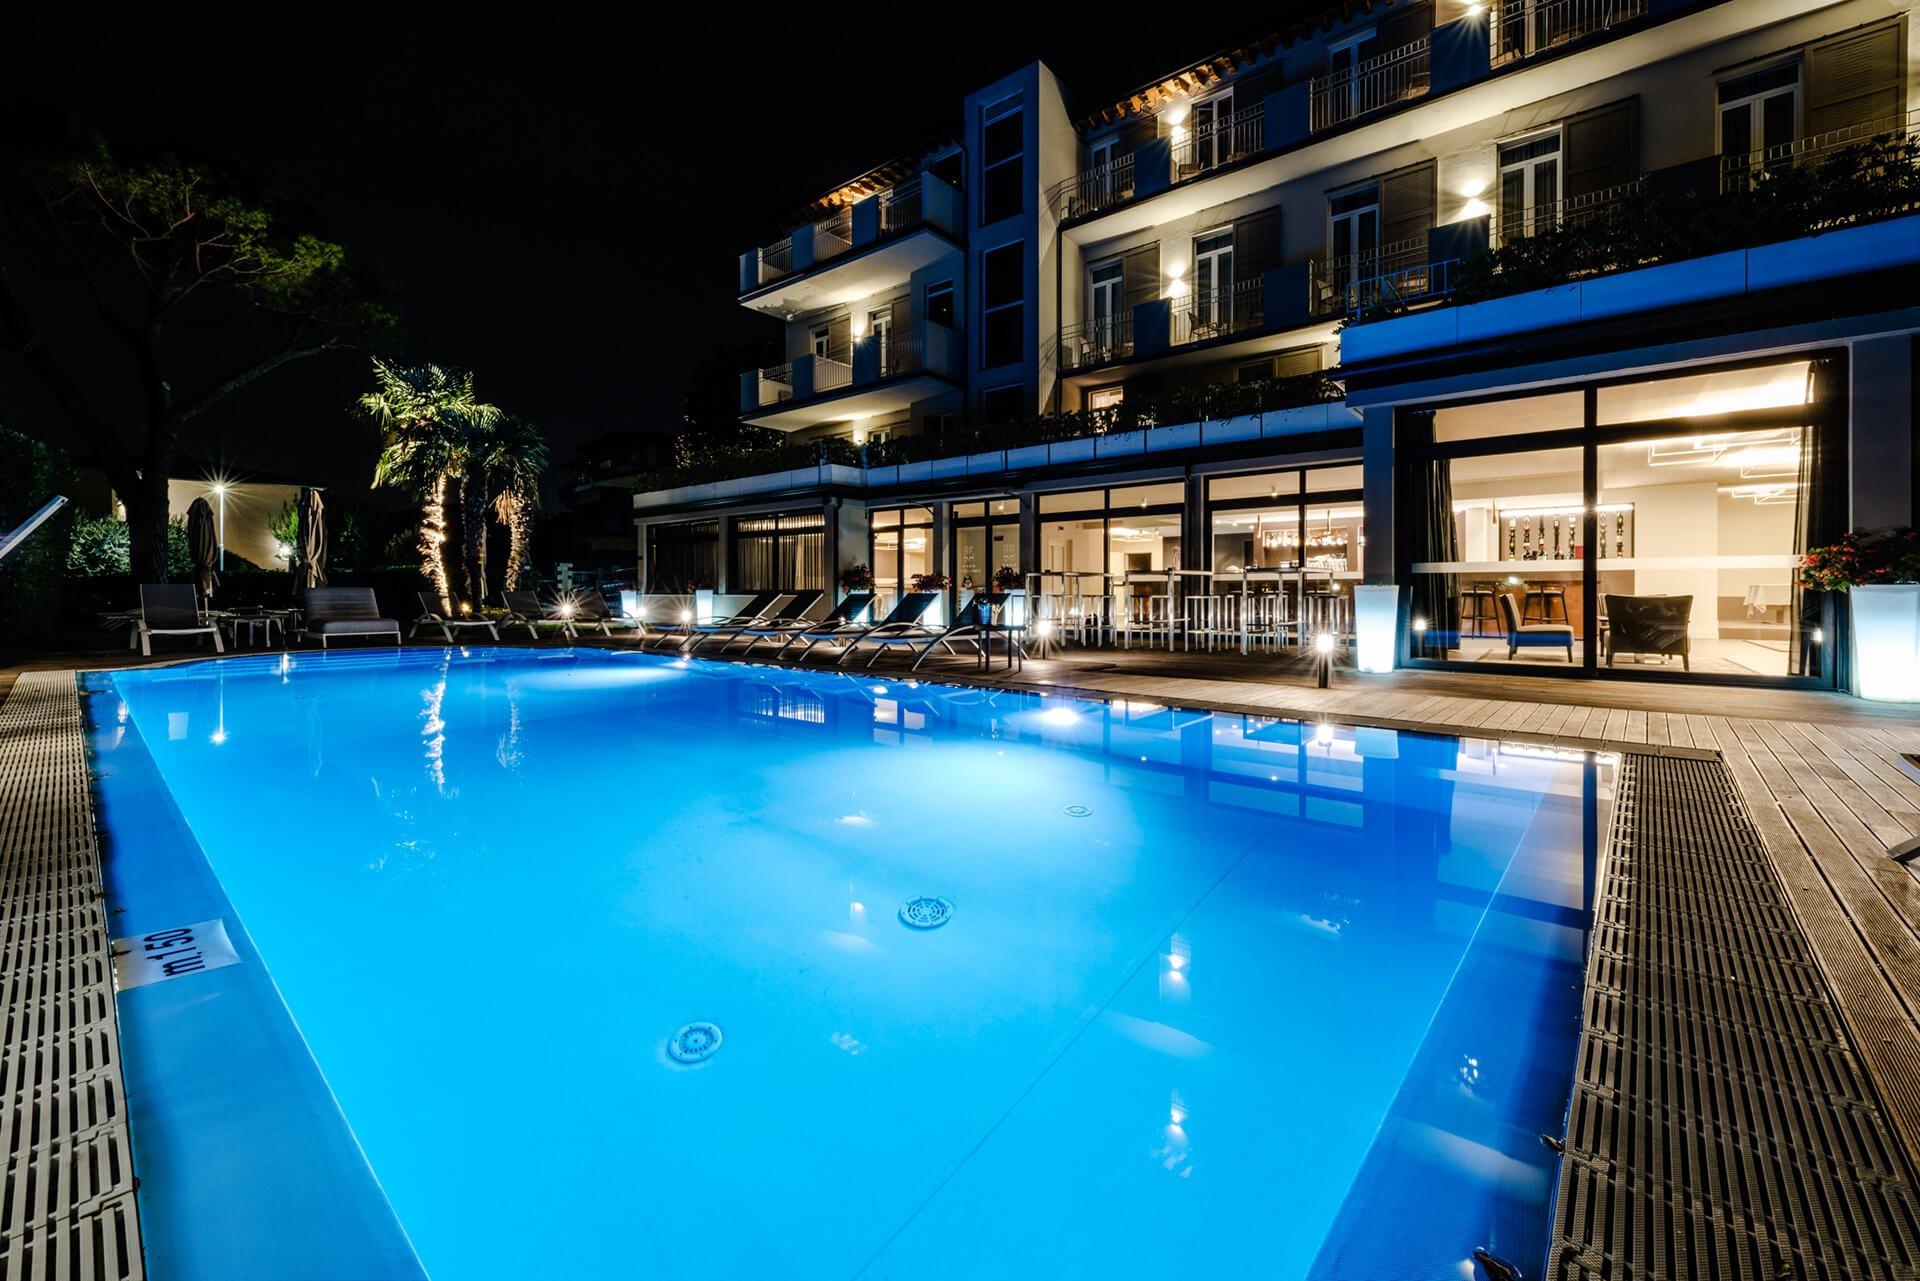 Ambienti Riva Del Garda 4 stars hotel in desenzano del garda, overlooking lake garda